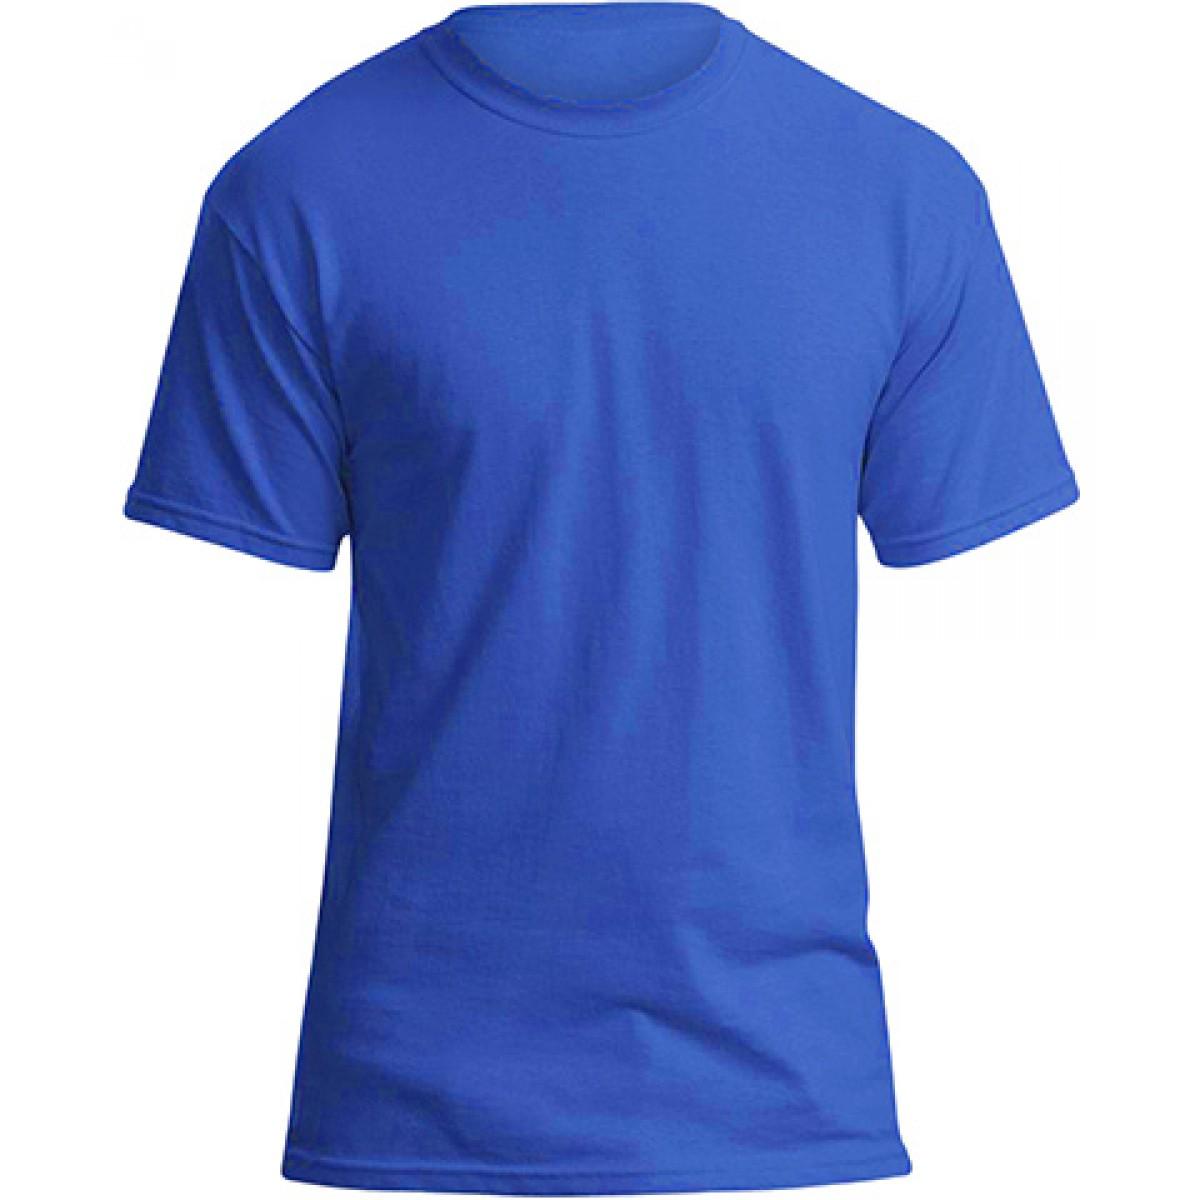 Soft 100% Cotton T-Shirt-Royal Blue-3XL